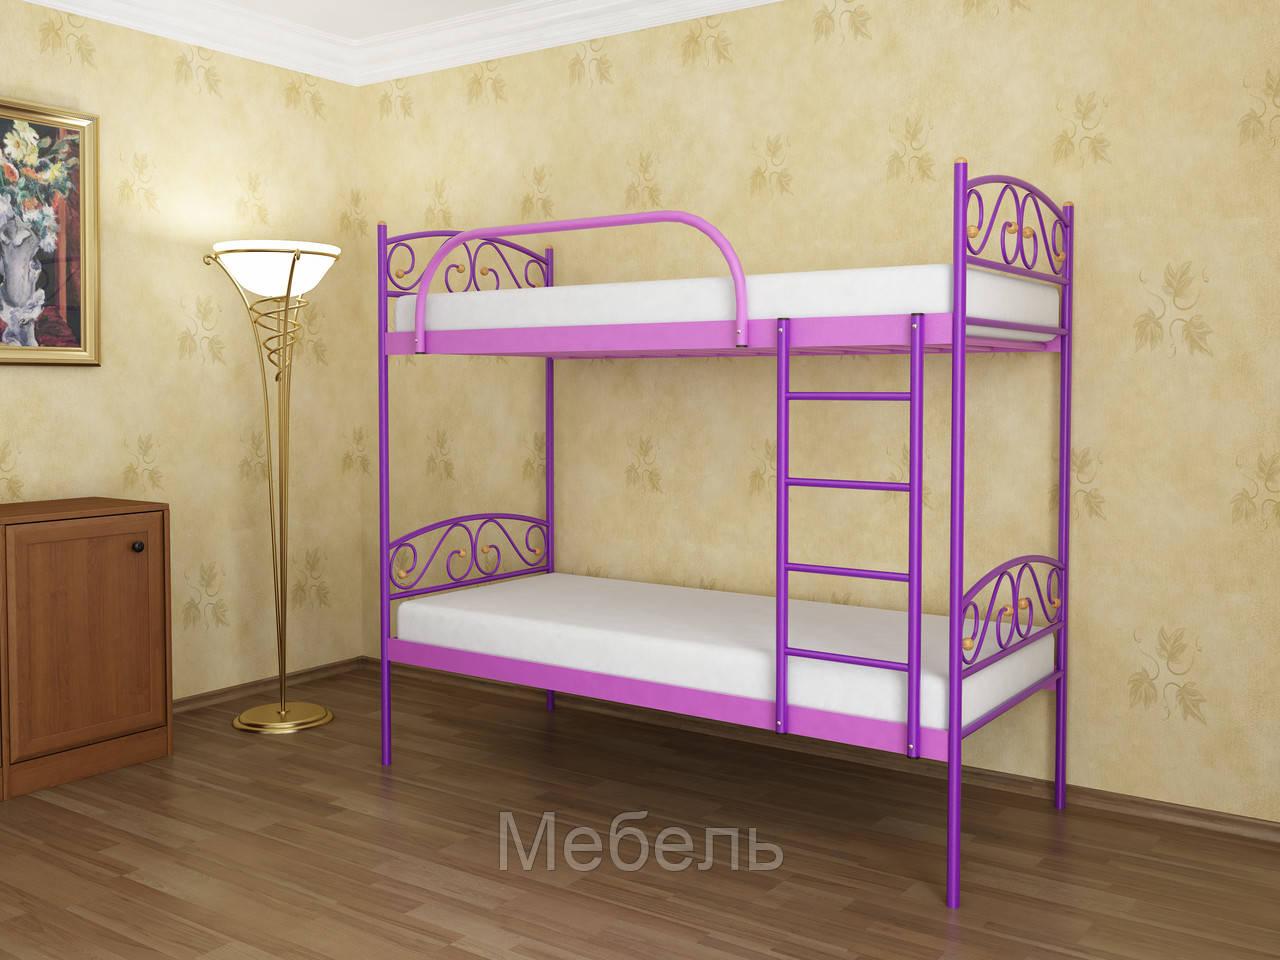 Двухъярусная кровать Верона Дуо Метакам